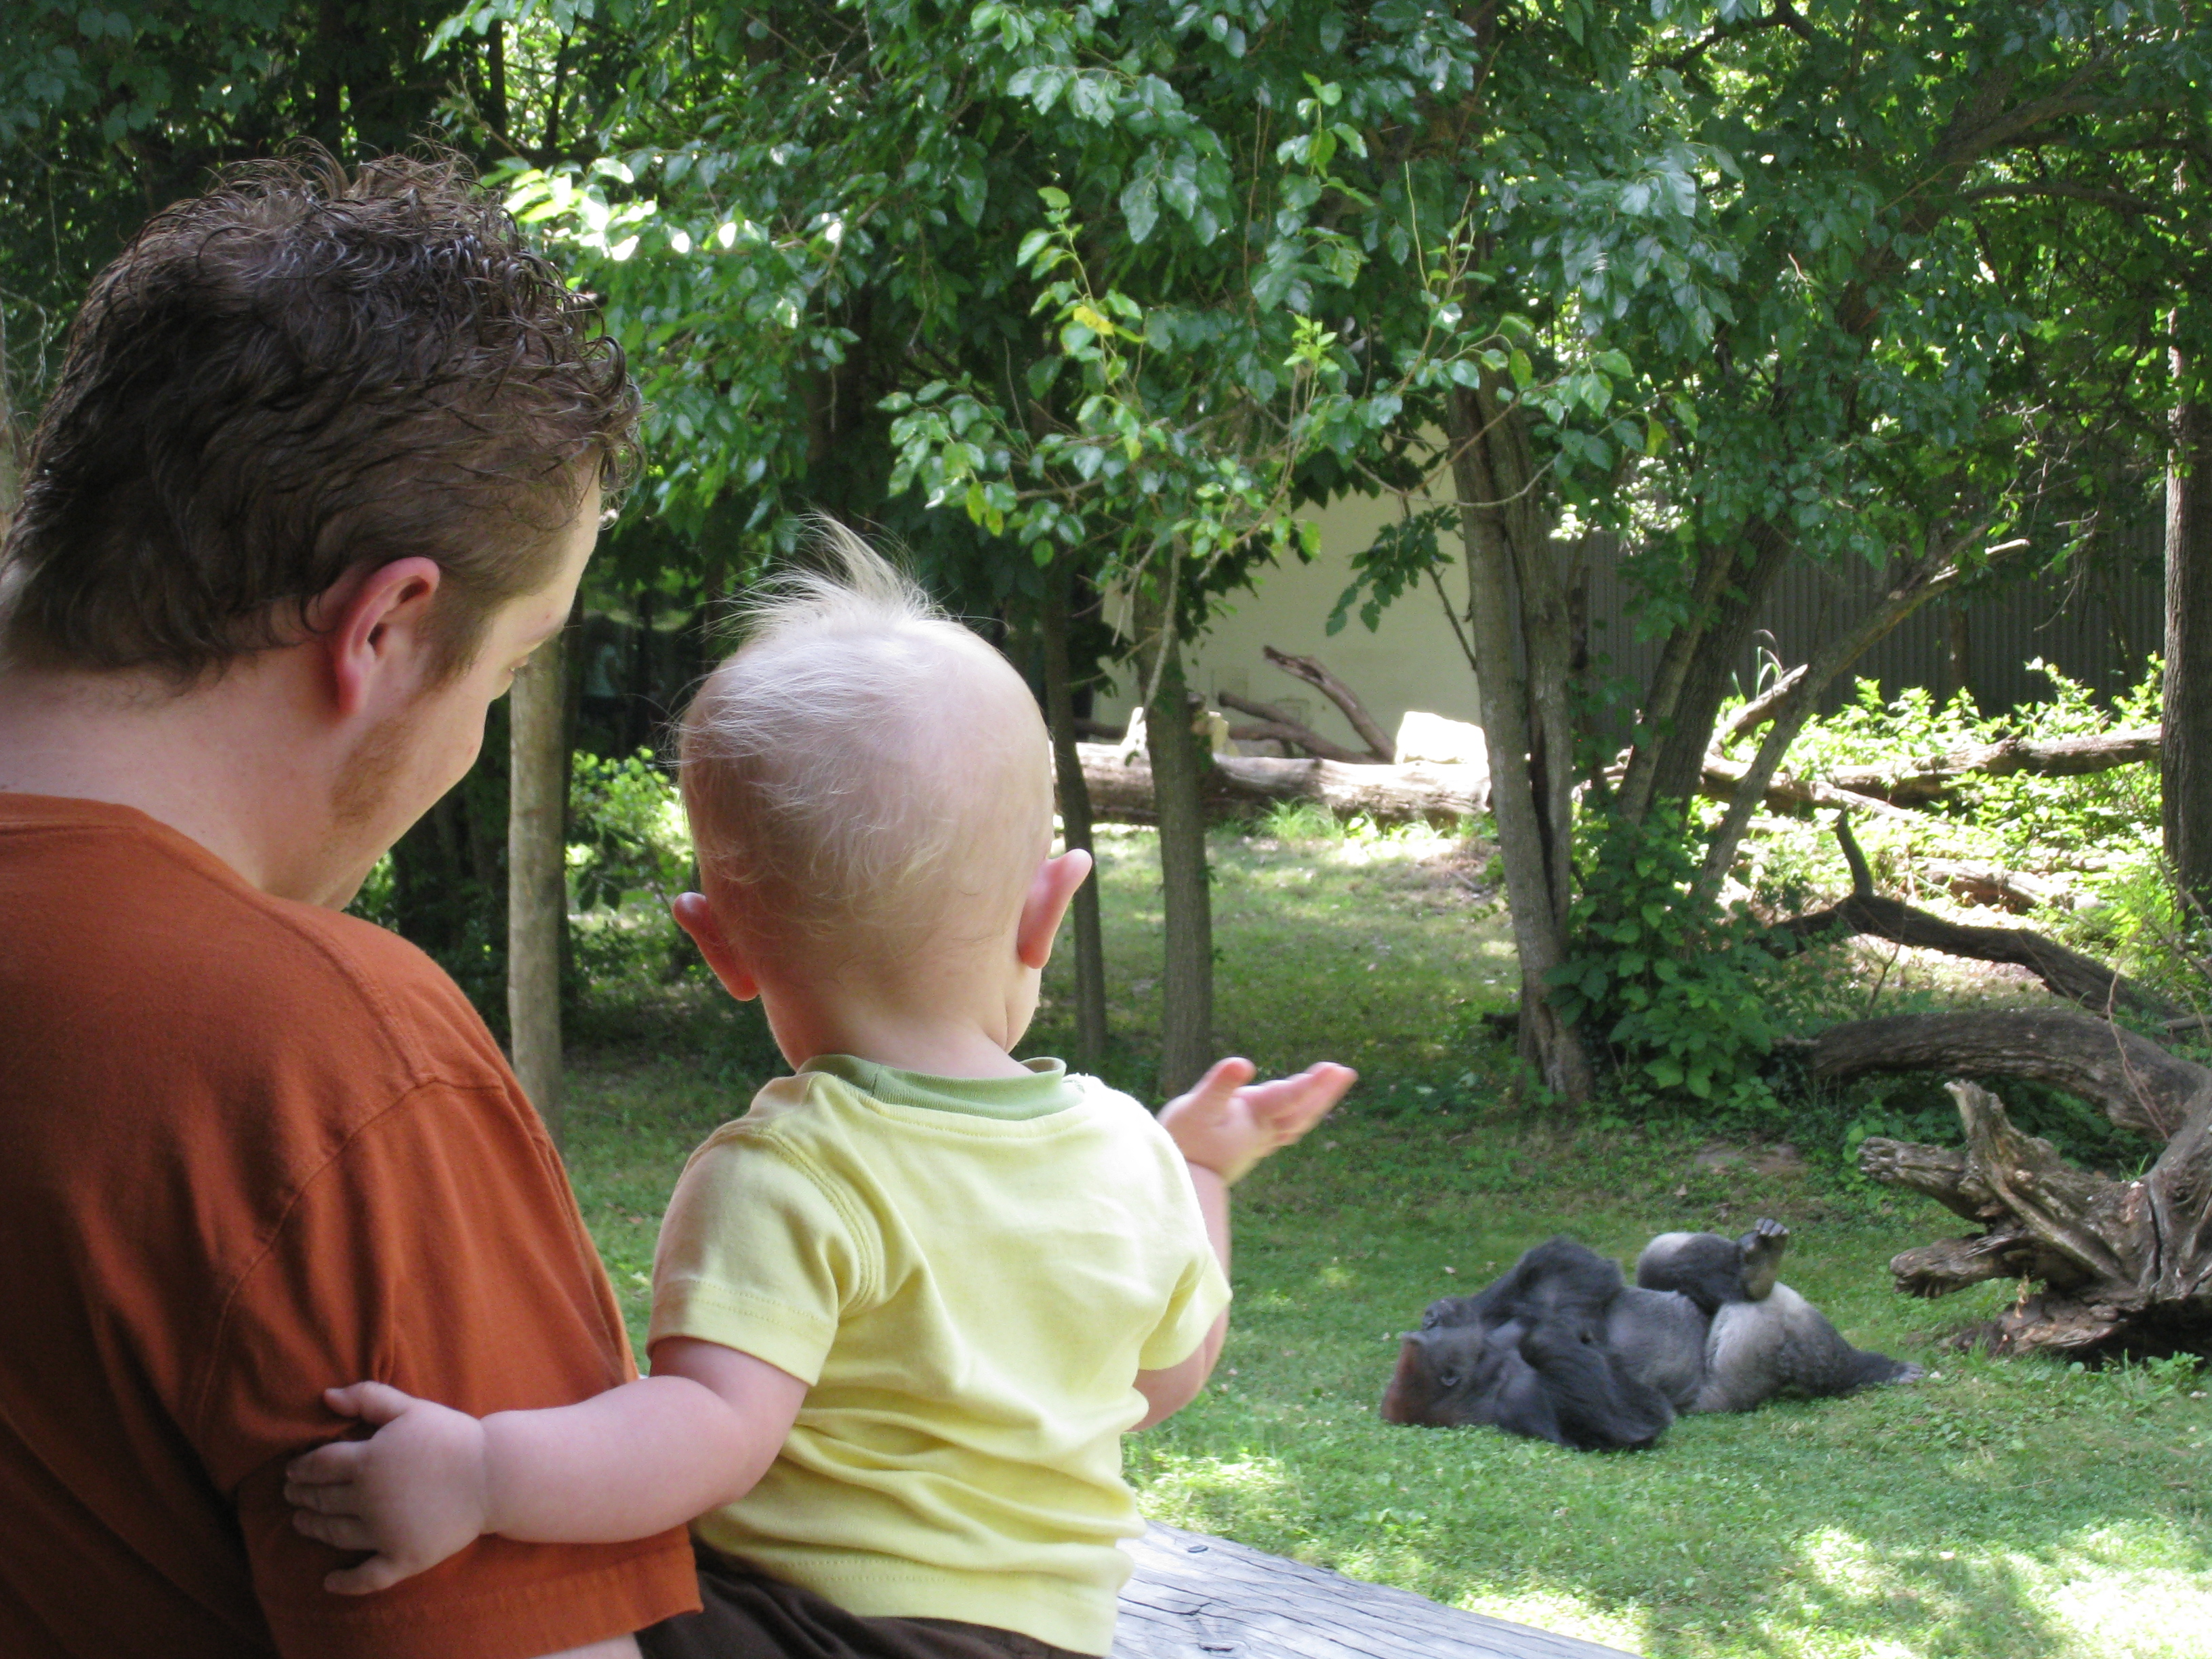 waving to the gorilla